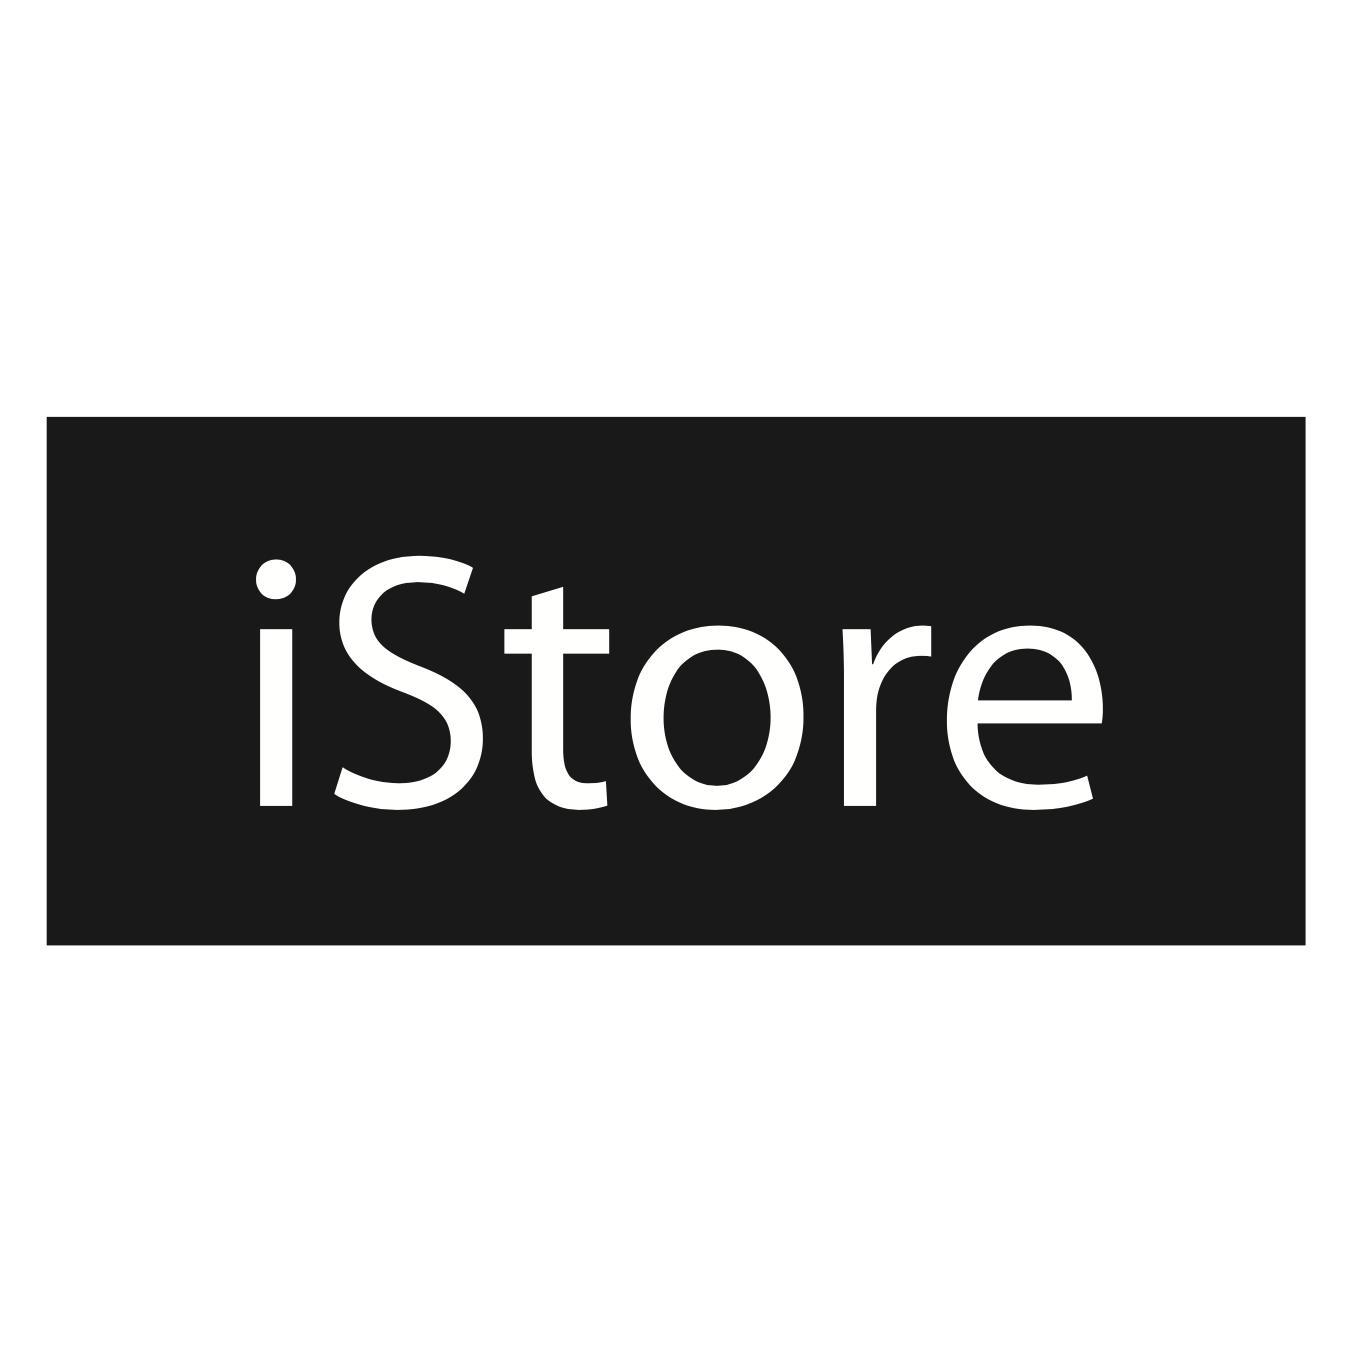 iPhone SE 16GB - Space Grey